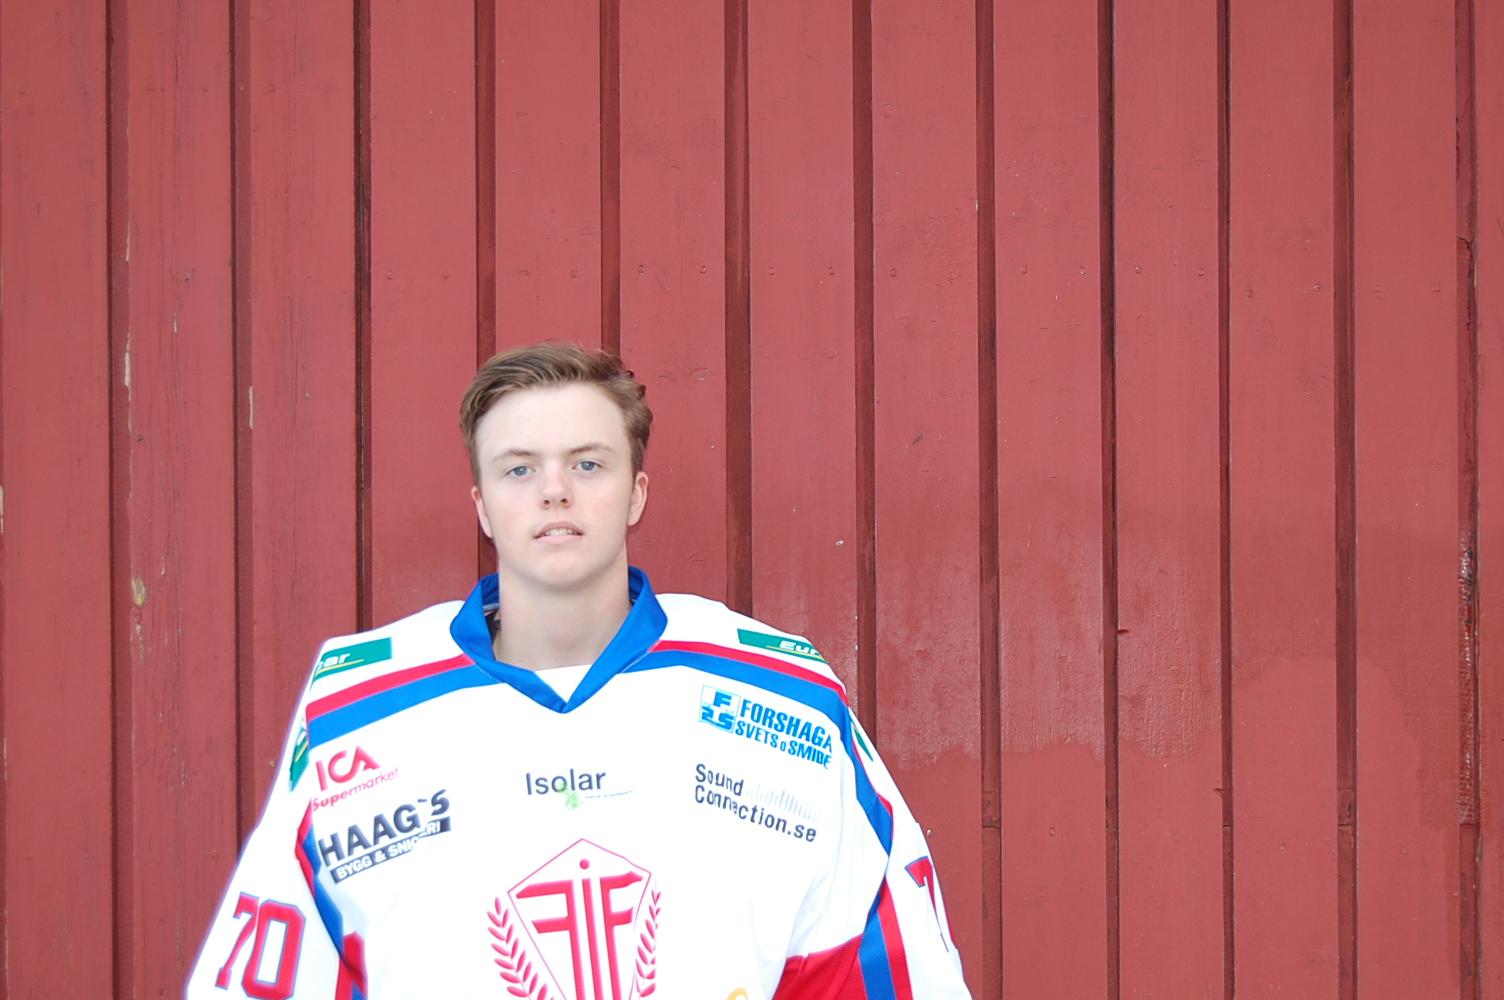 70 Andreas Kåberg